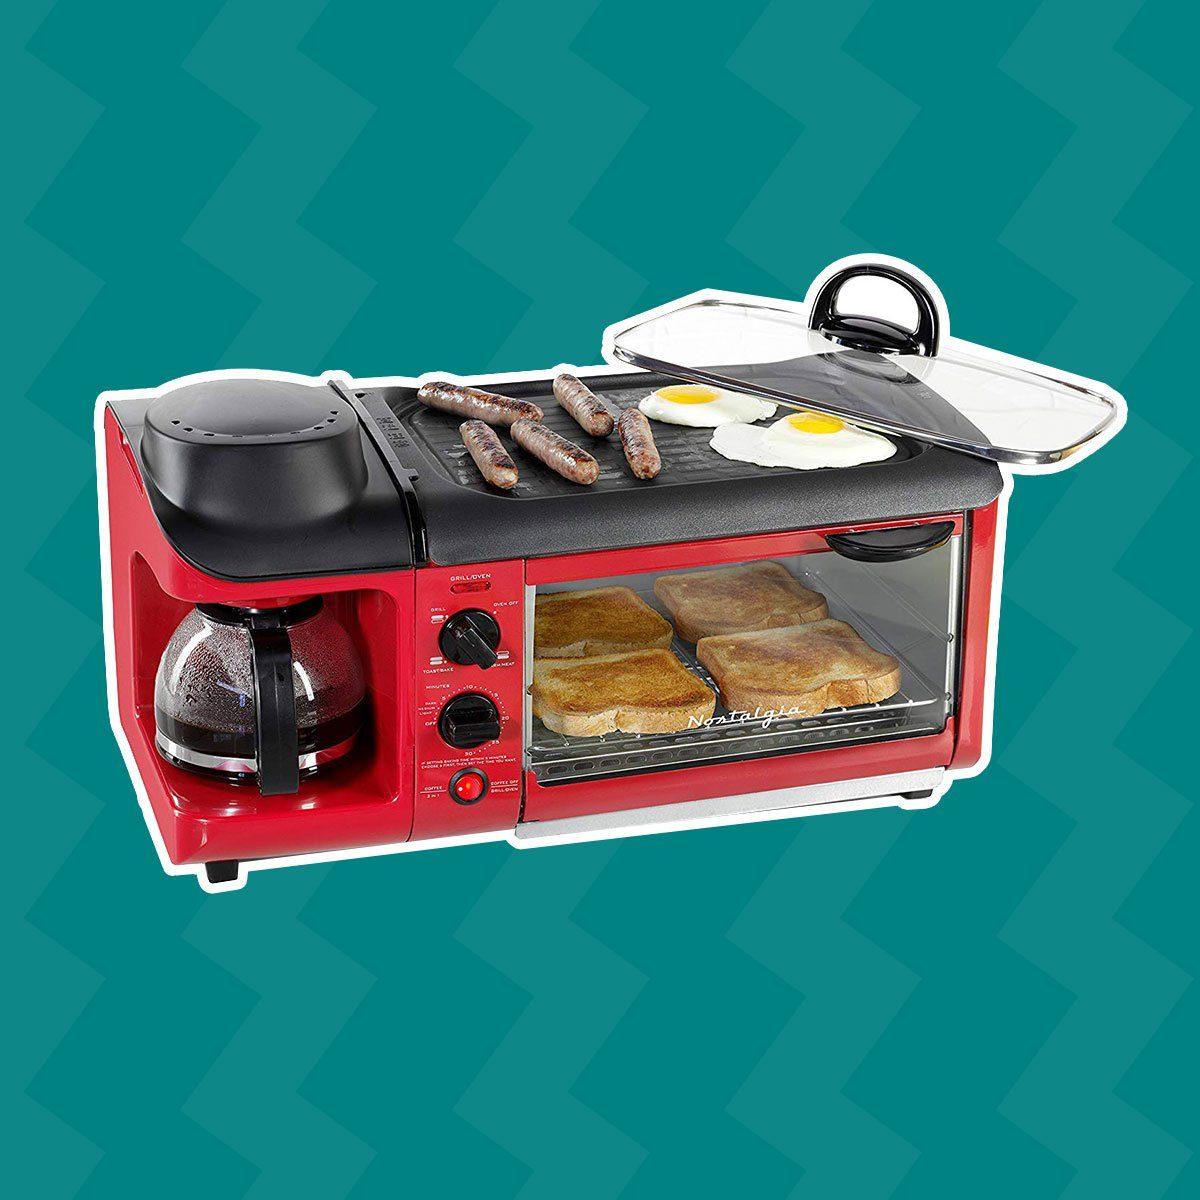 Nostalgia Breakfast Station